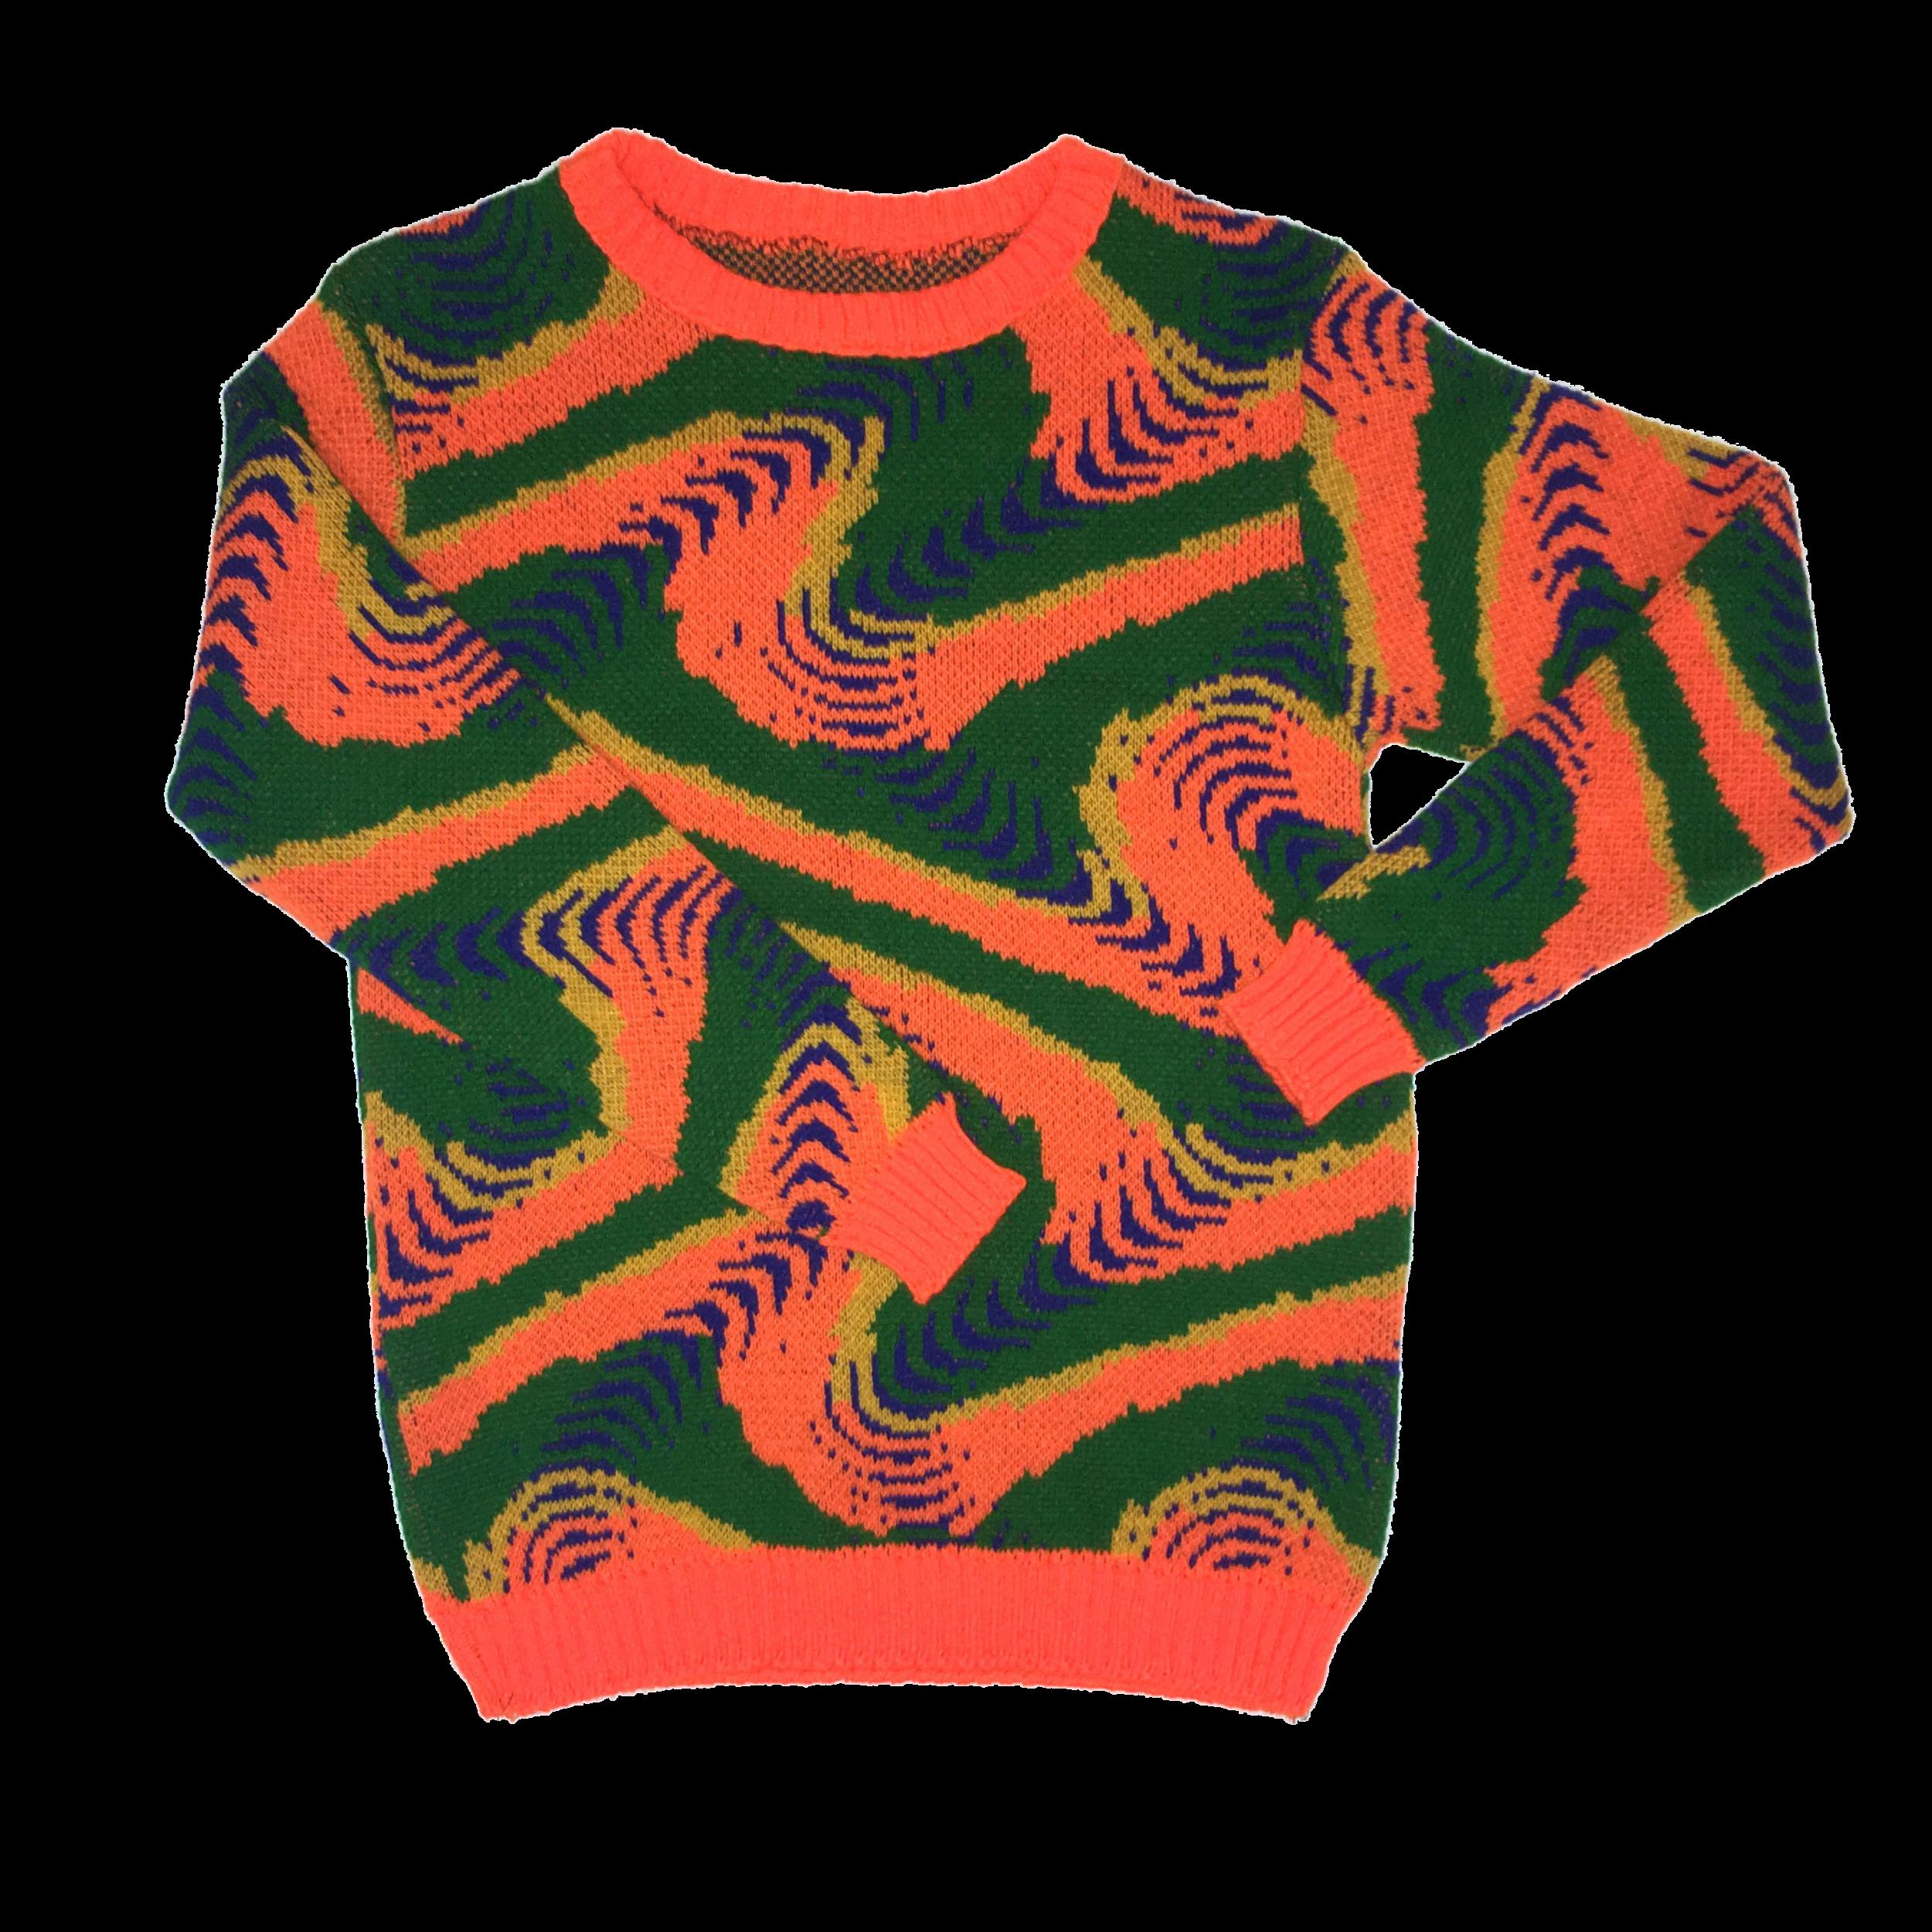 sweater-1 copy copy.png